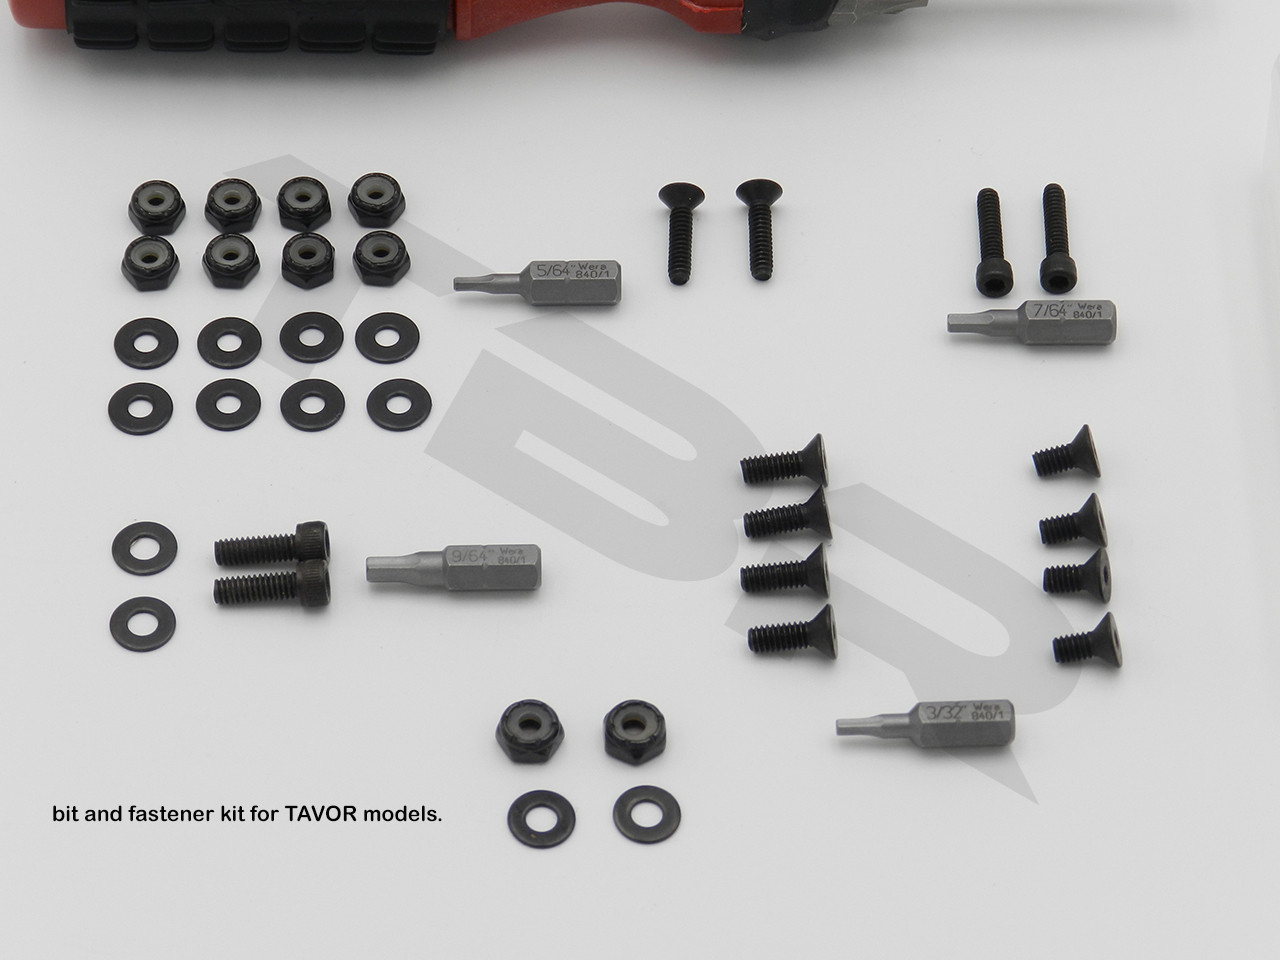 bit and fastener kit for TAVOR models